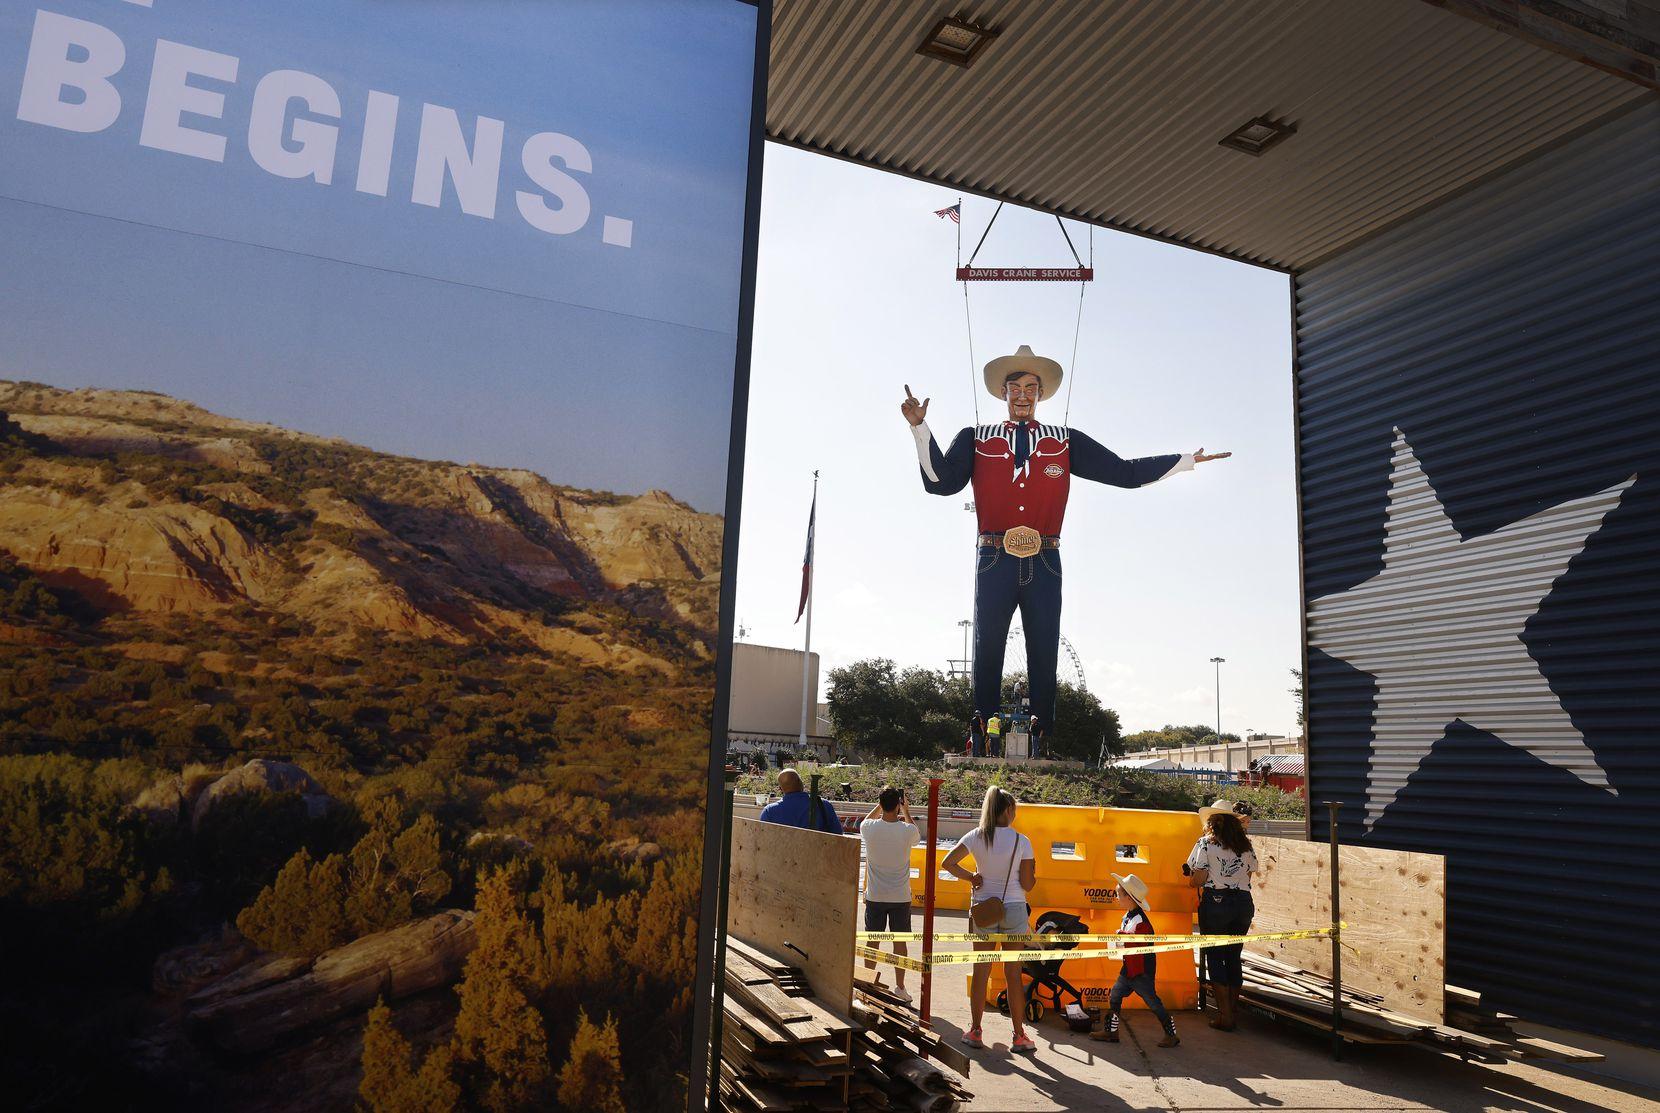 Big Tex fue levantado la mañana del viernes 17, una semana antes de la gran jornada inaugural de la Feria Estatal.